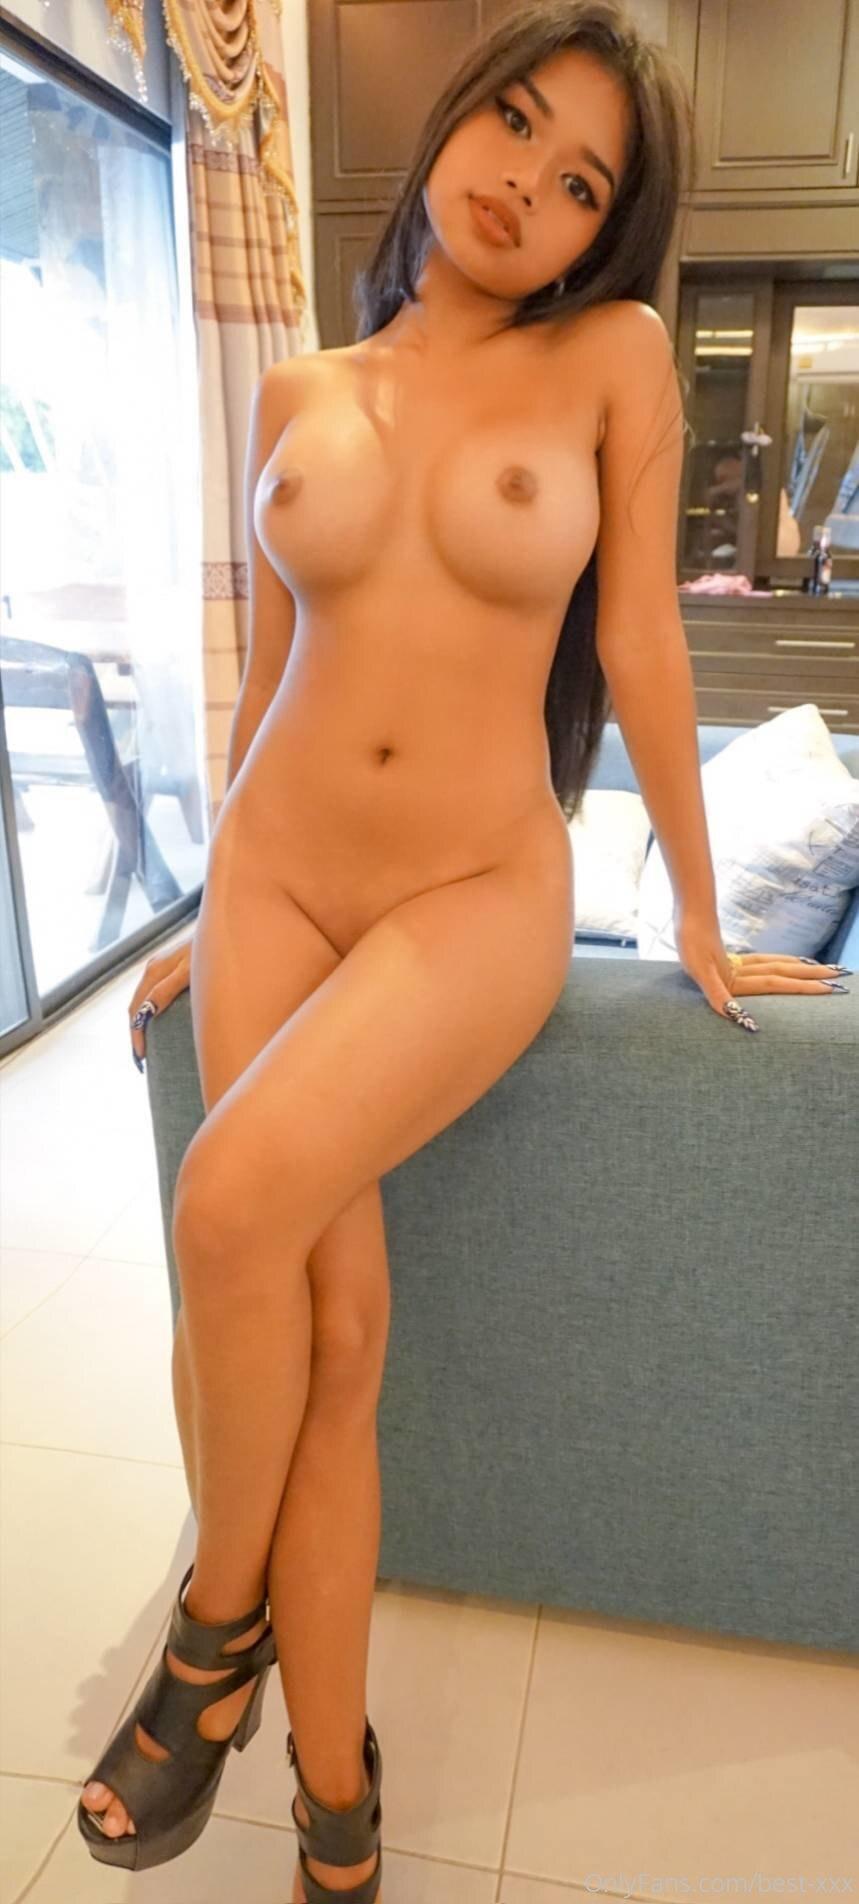 Mo Thai Pattaya Girl Leaked Onlyfans Best Xxx 0097